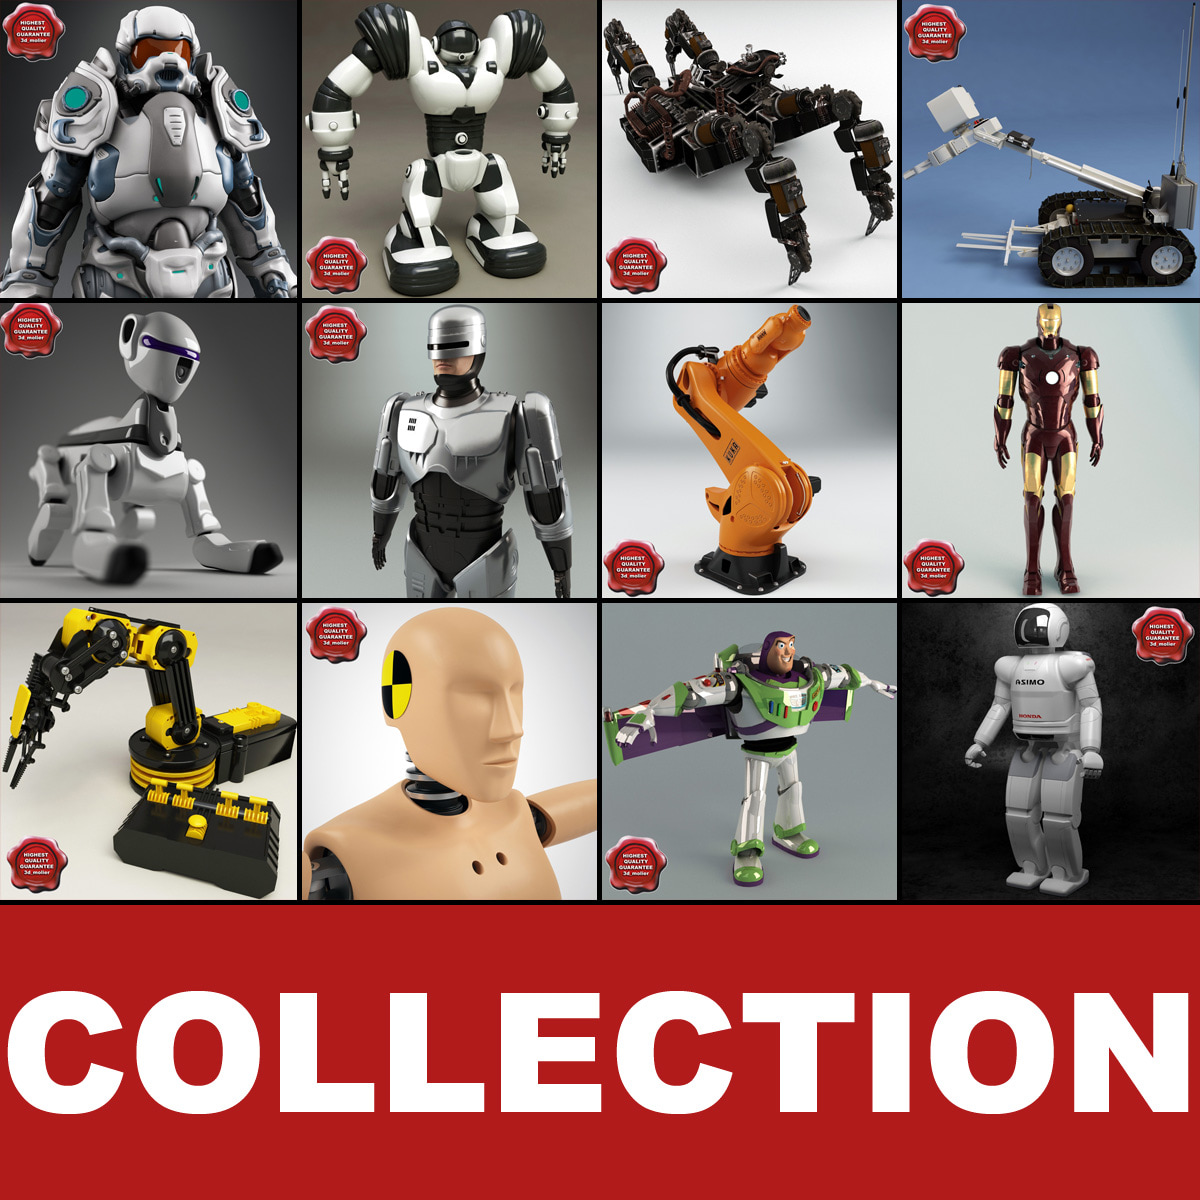 Robots_Collection_V5_000.jpg